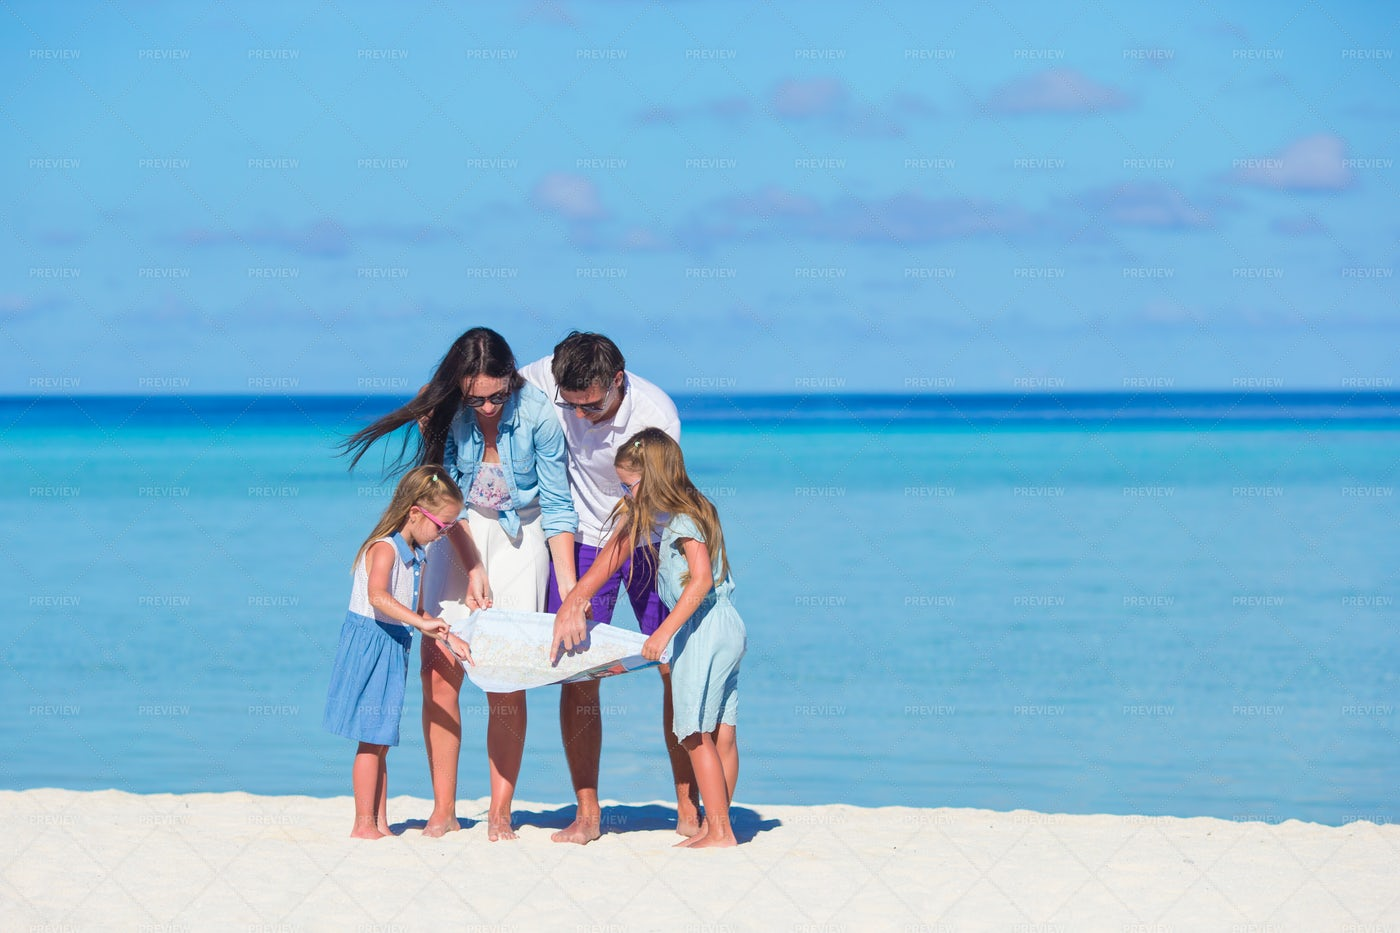 Family Viewing A Map: Stock Photos